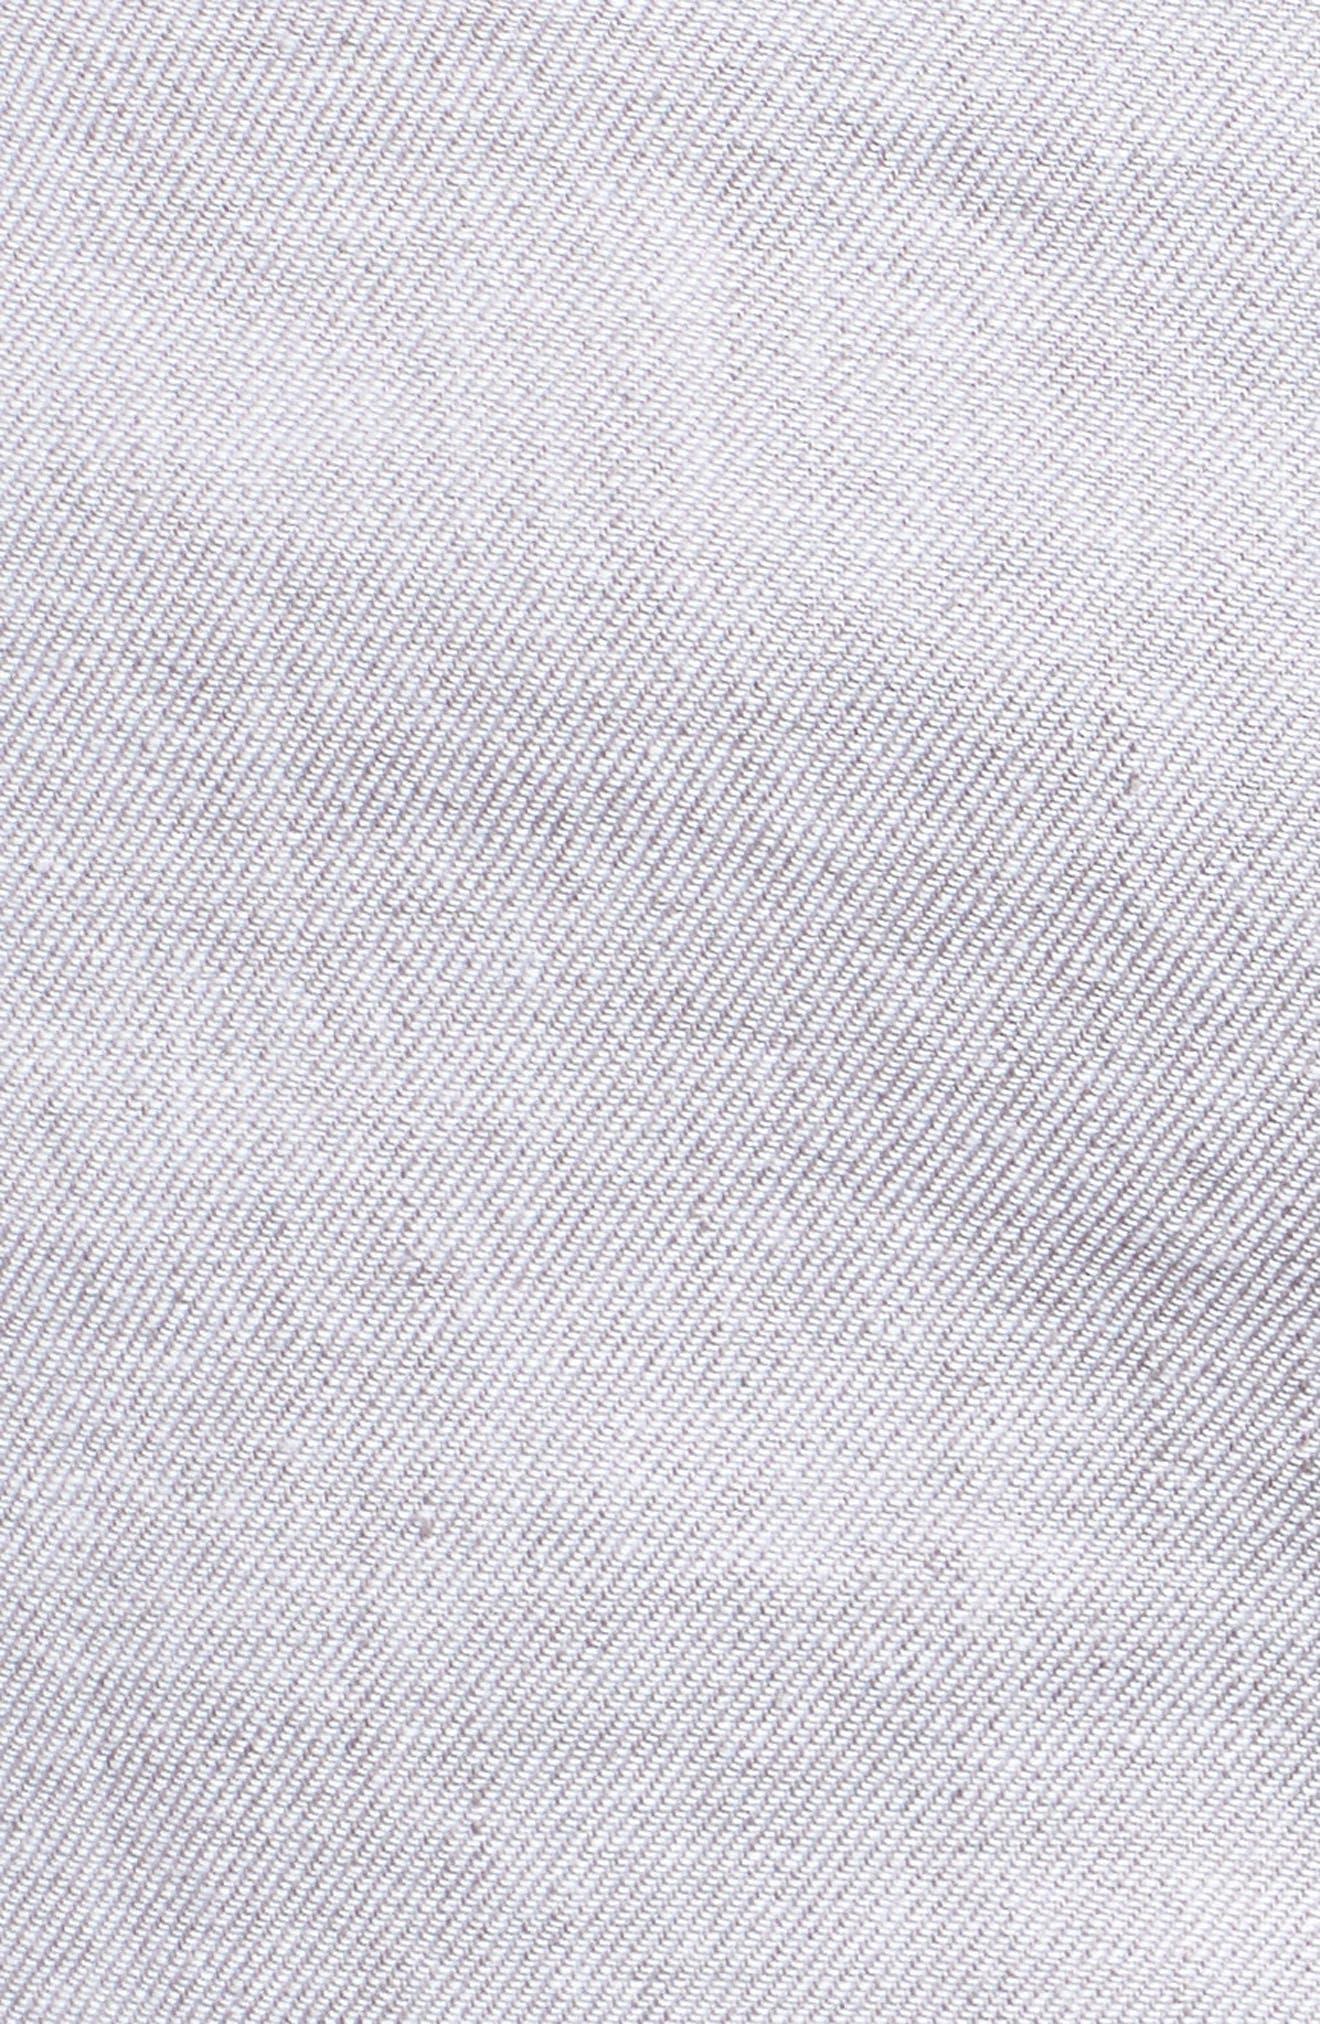 Beach Linen Blend Shorts,                             Alternate thumbnail 5, color,                             Storm Gray